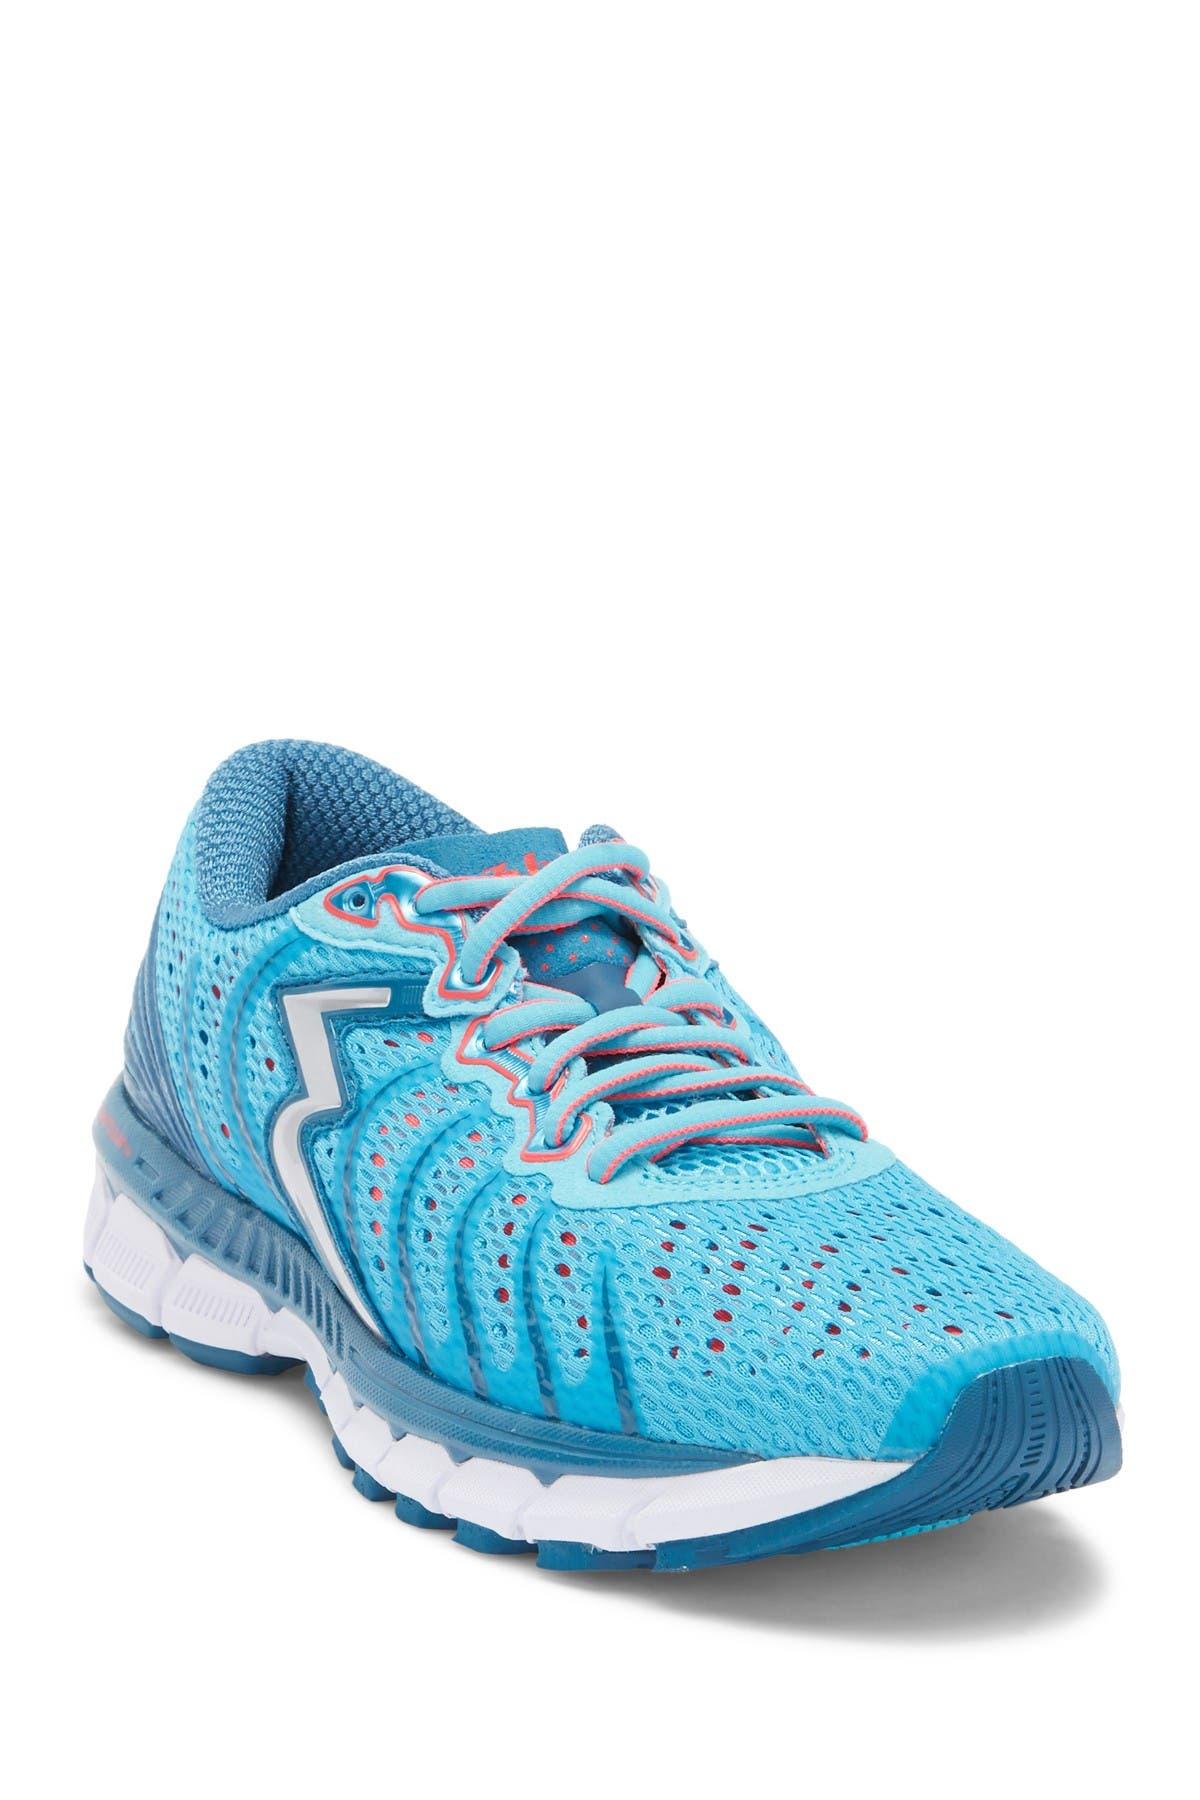 361 Degrees   Stratomic Running Shoe